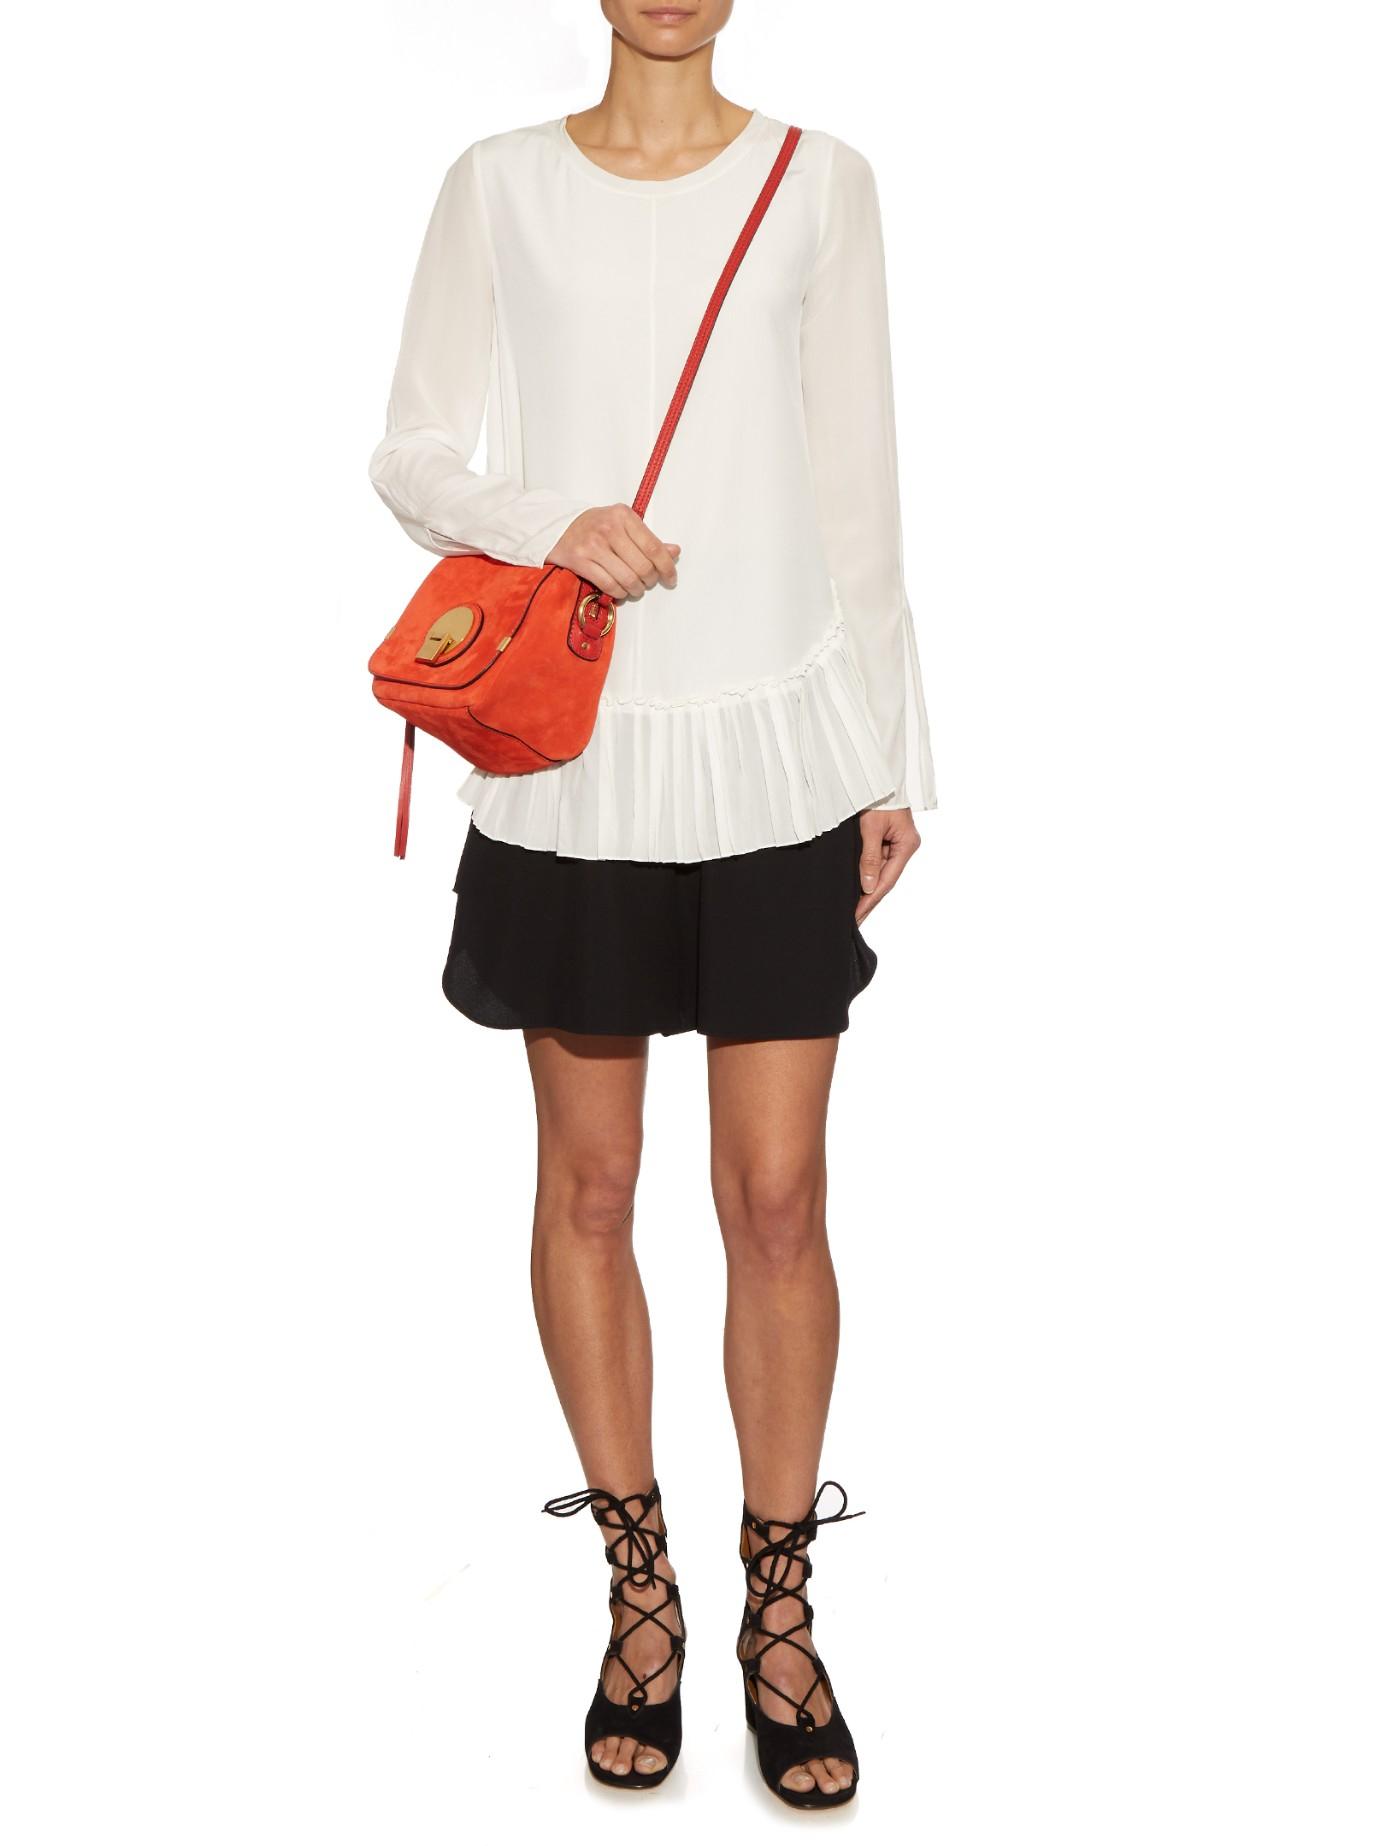 replica chloe handbags uk - chloe indy small leather shoulder bag, chloe shopping online